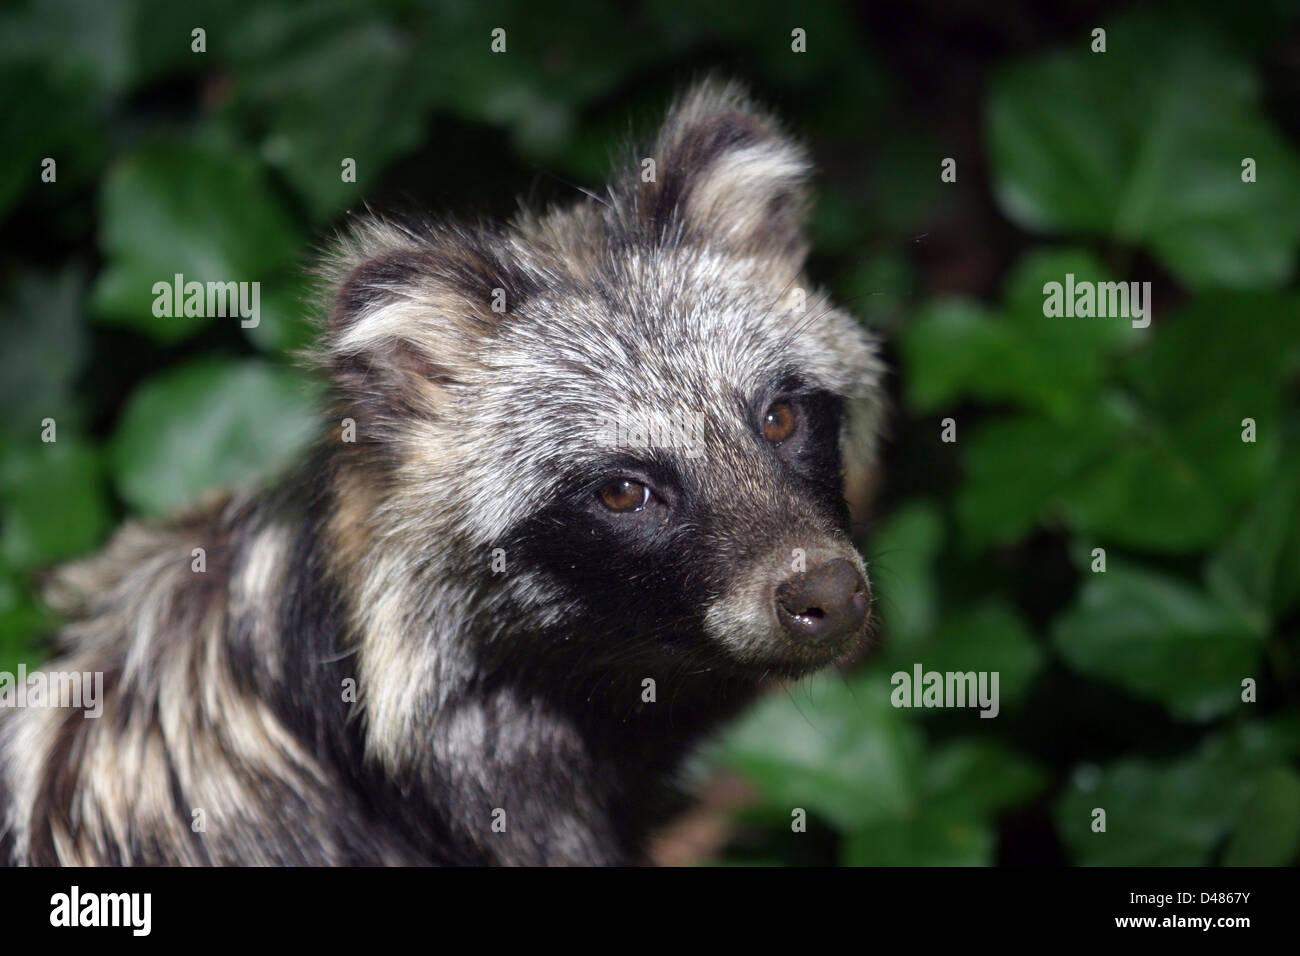 raccoon dog (Nyctereutes procyonoides) close up. - Stock Image